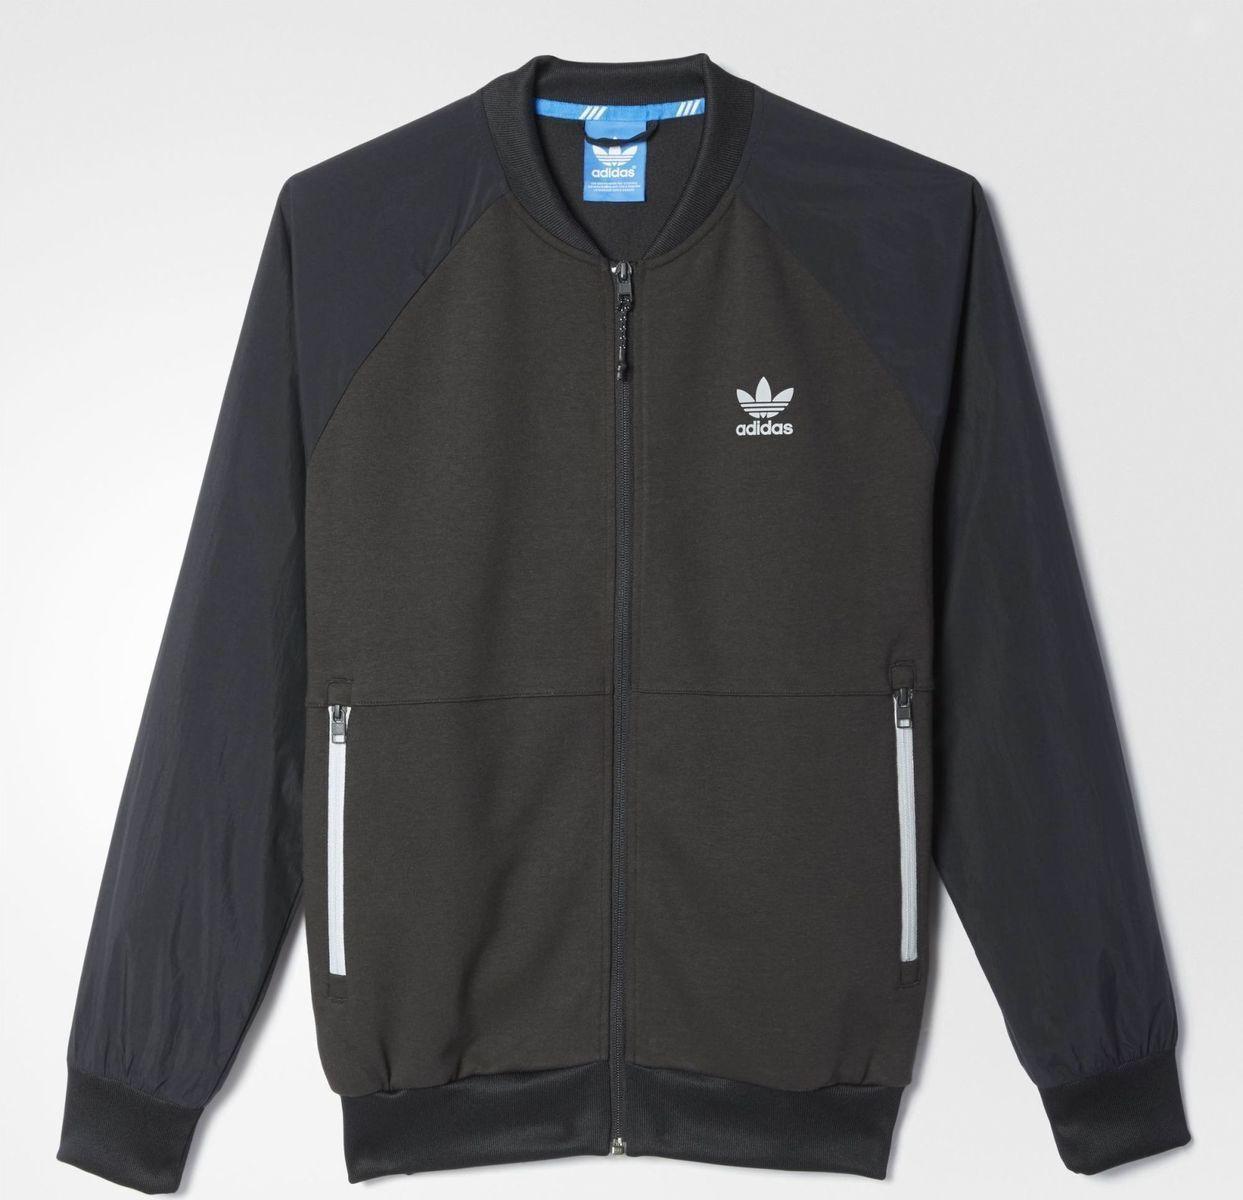 Adidas Originals Mens Sport Luxe Σκουλαρίκια Μαύρο AY8414 XS, S, M, XL